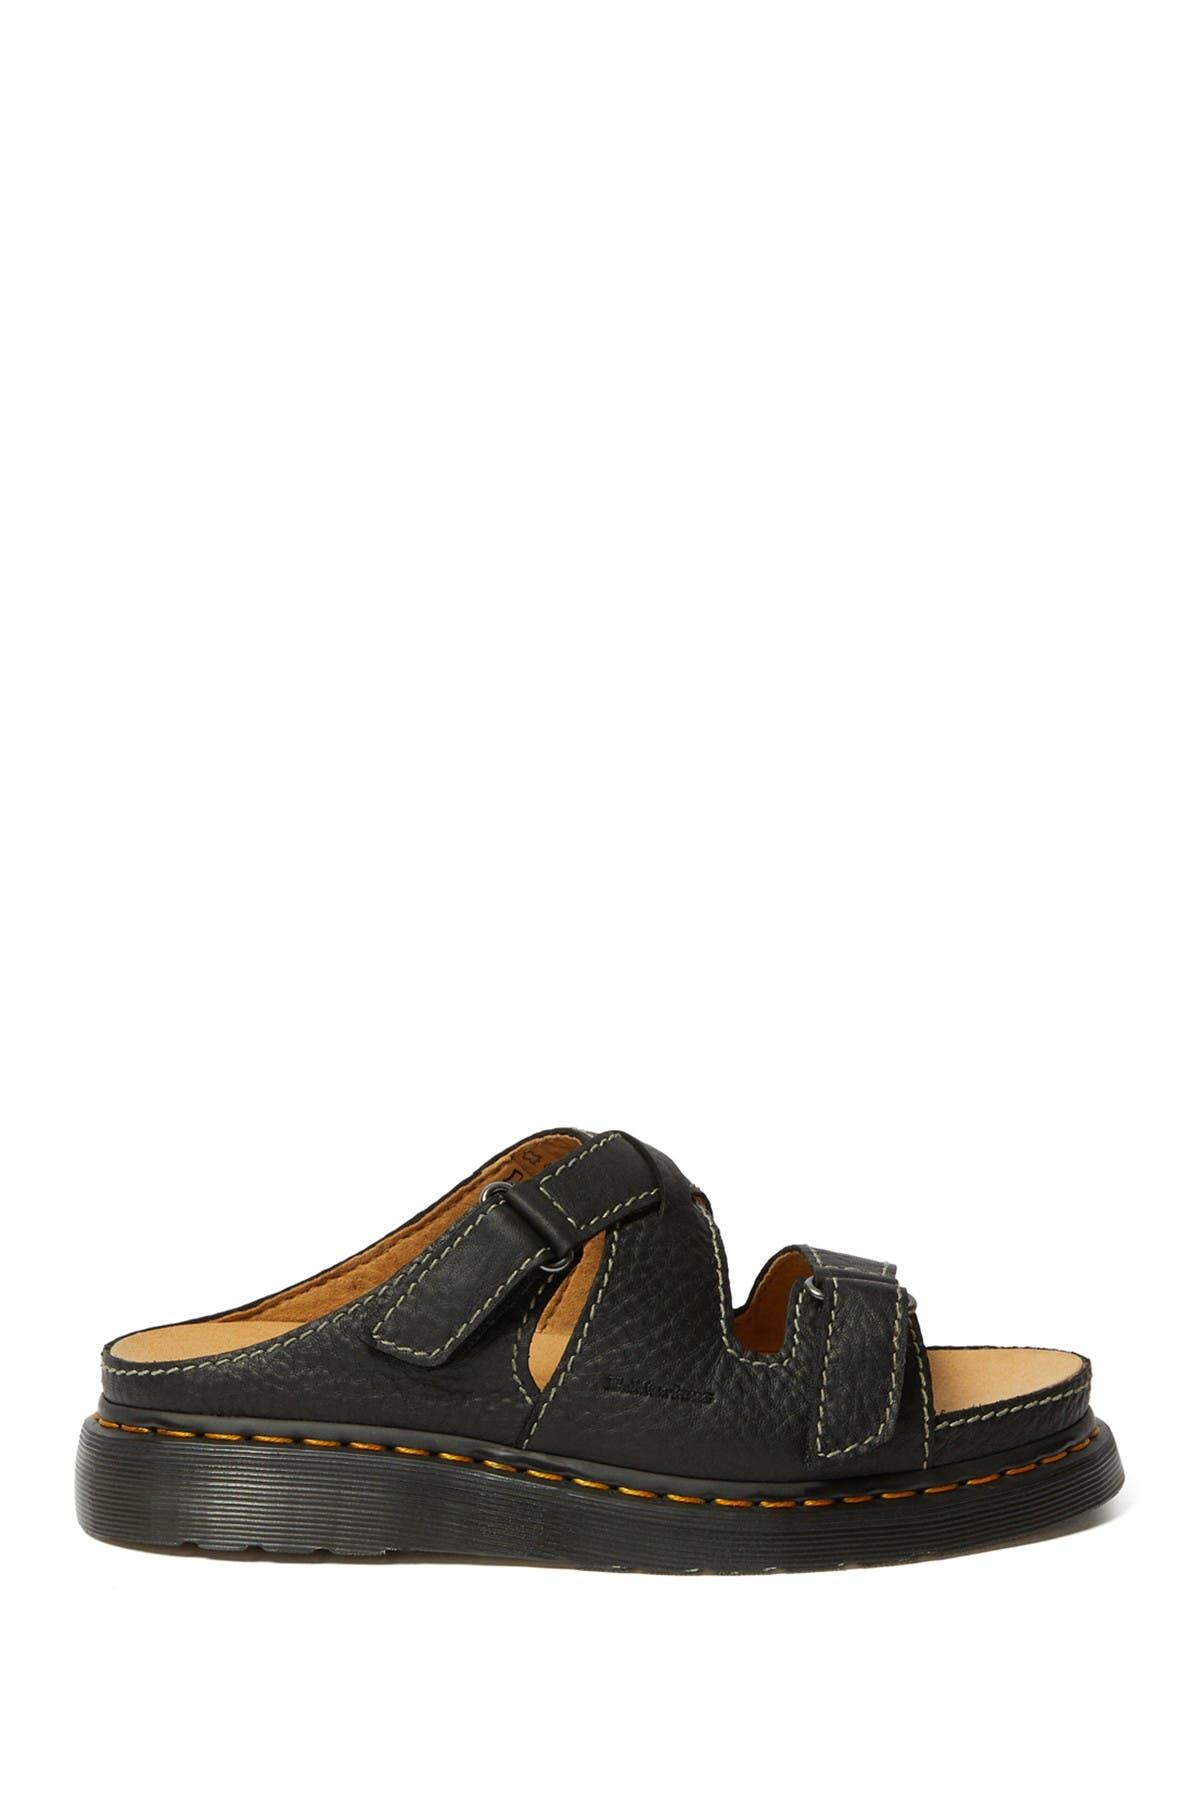 Image of Dr. Martens Bradfield Leather Sandal